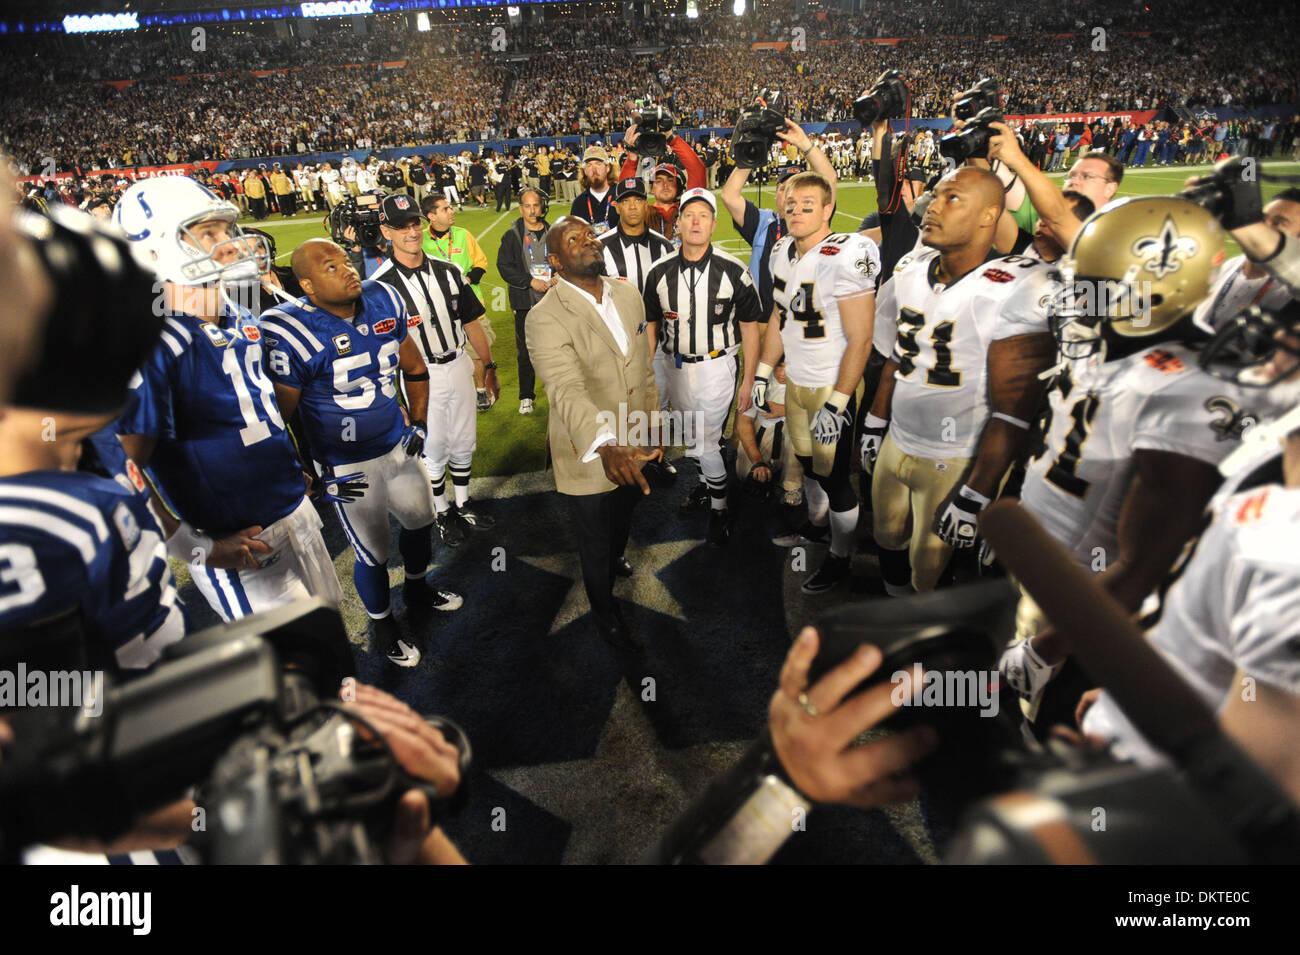 Feb 07, 2010 - Miami Gardens, Florida, USA - University of Florida alumni and NFL star Emmett Smiith does the coin flip at the start of Super Bowl XLIV at Sun Life Stadium. (Credit Image: © Jim Rassol/Sun-Sentinel/ZUMApress.com) RESTRICTIONS: * U.S. Tabloids Rights OUT * - Stock Image